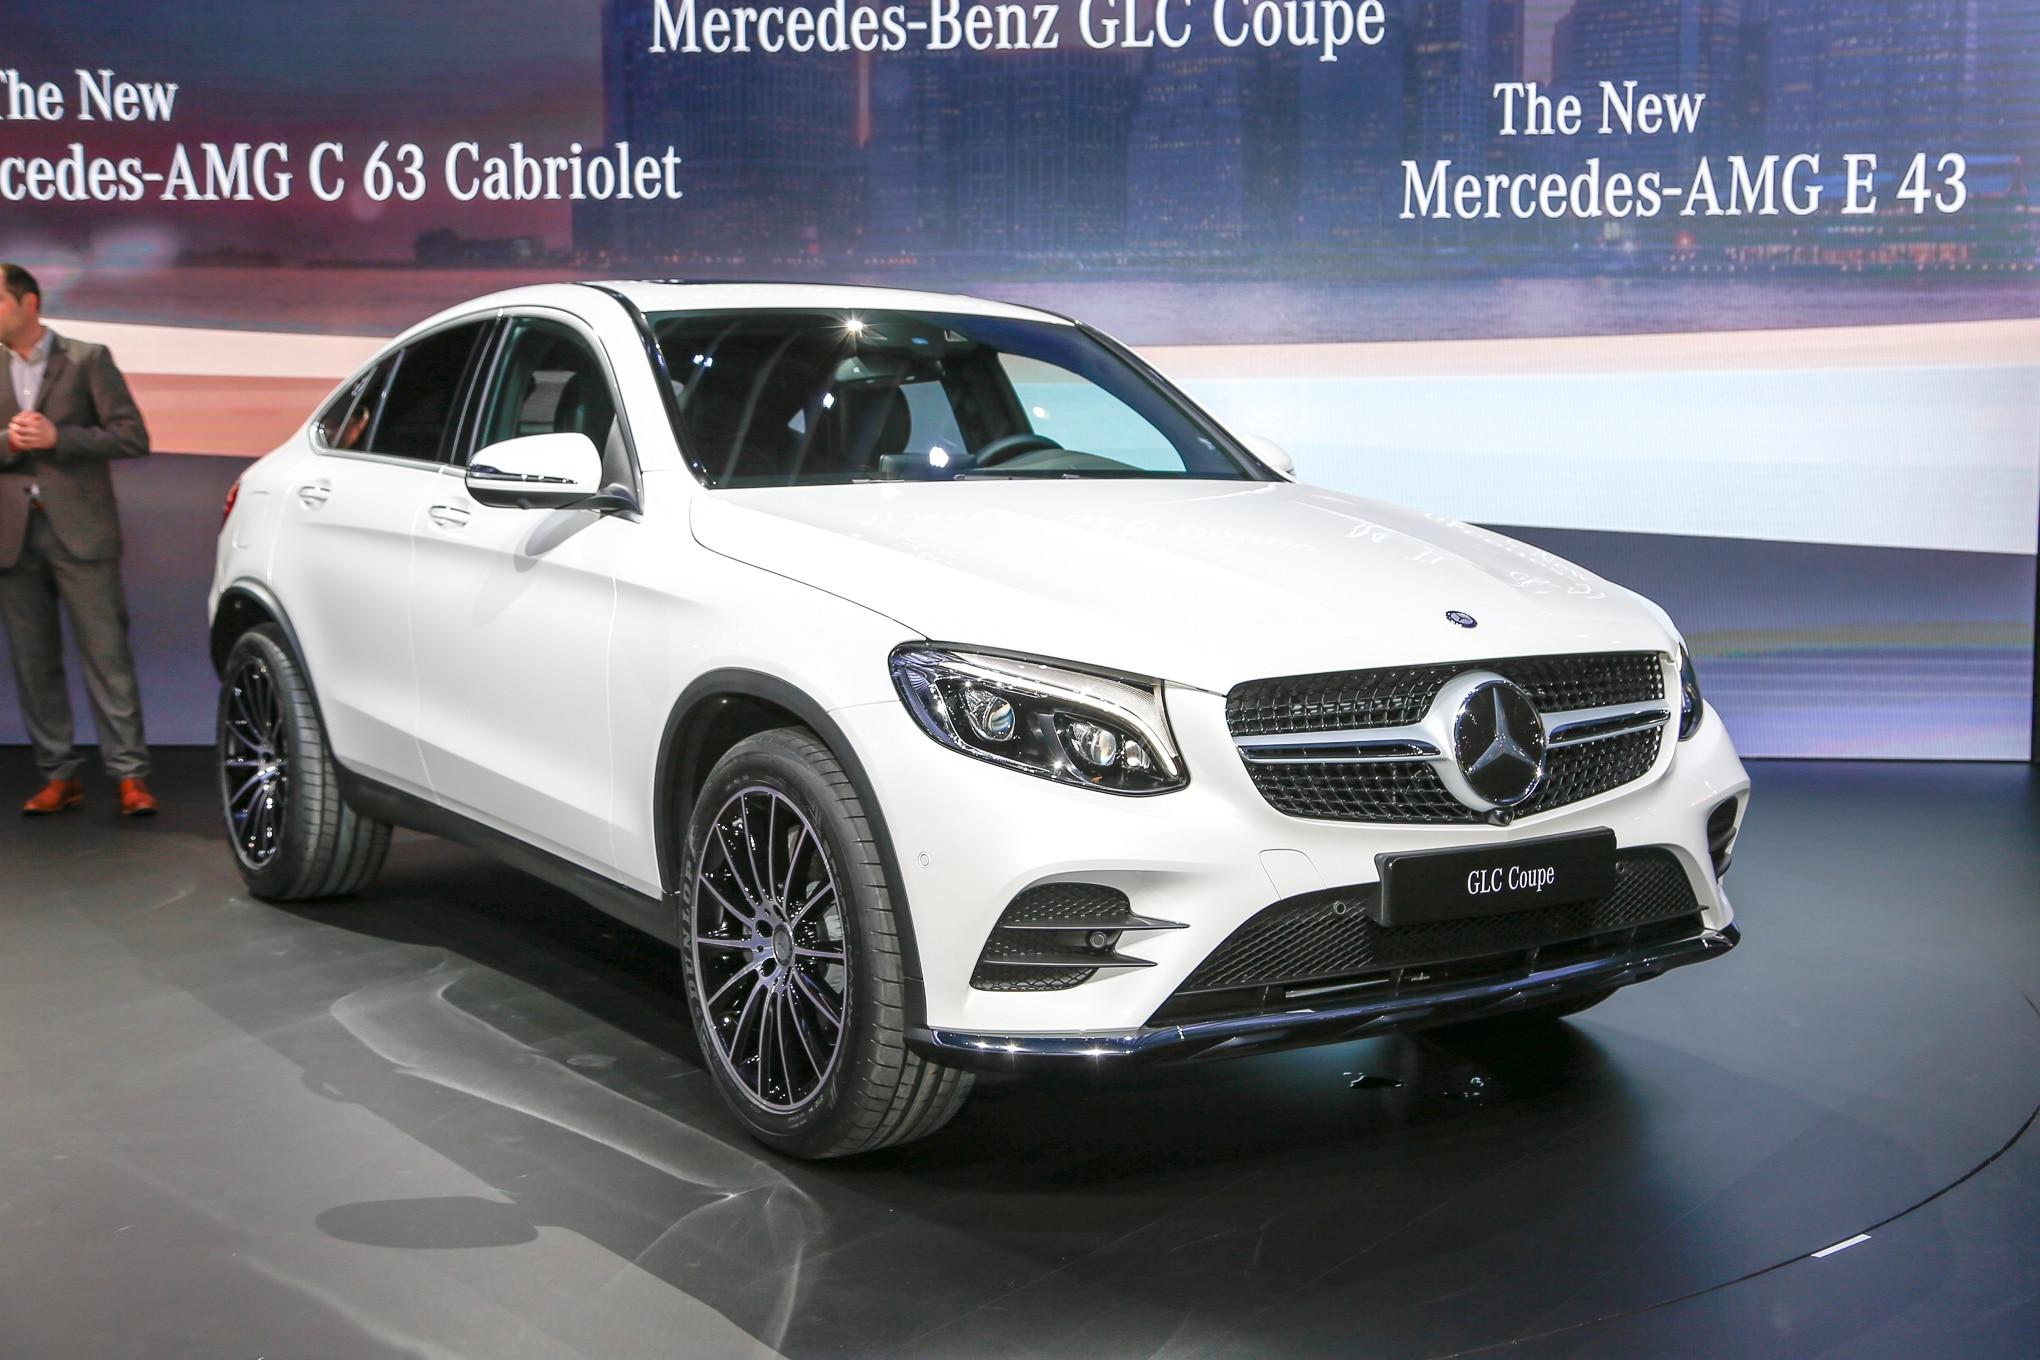 2017 Mercedes Benz GLC Coupe Front Three Quarter